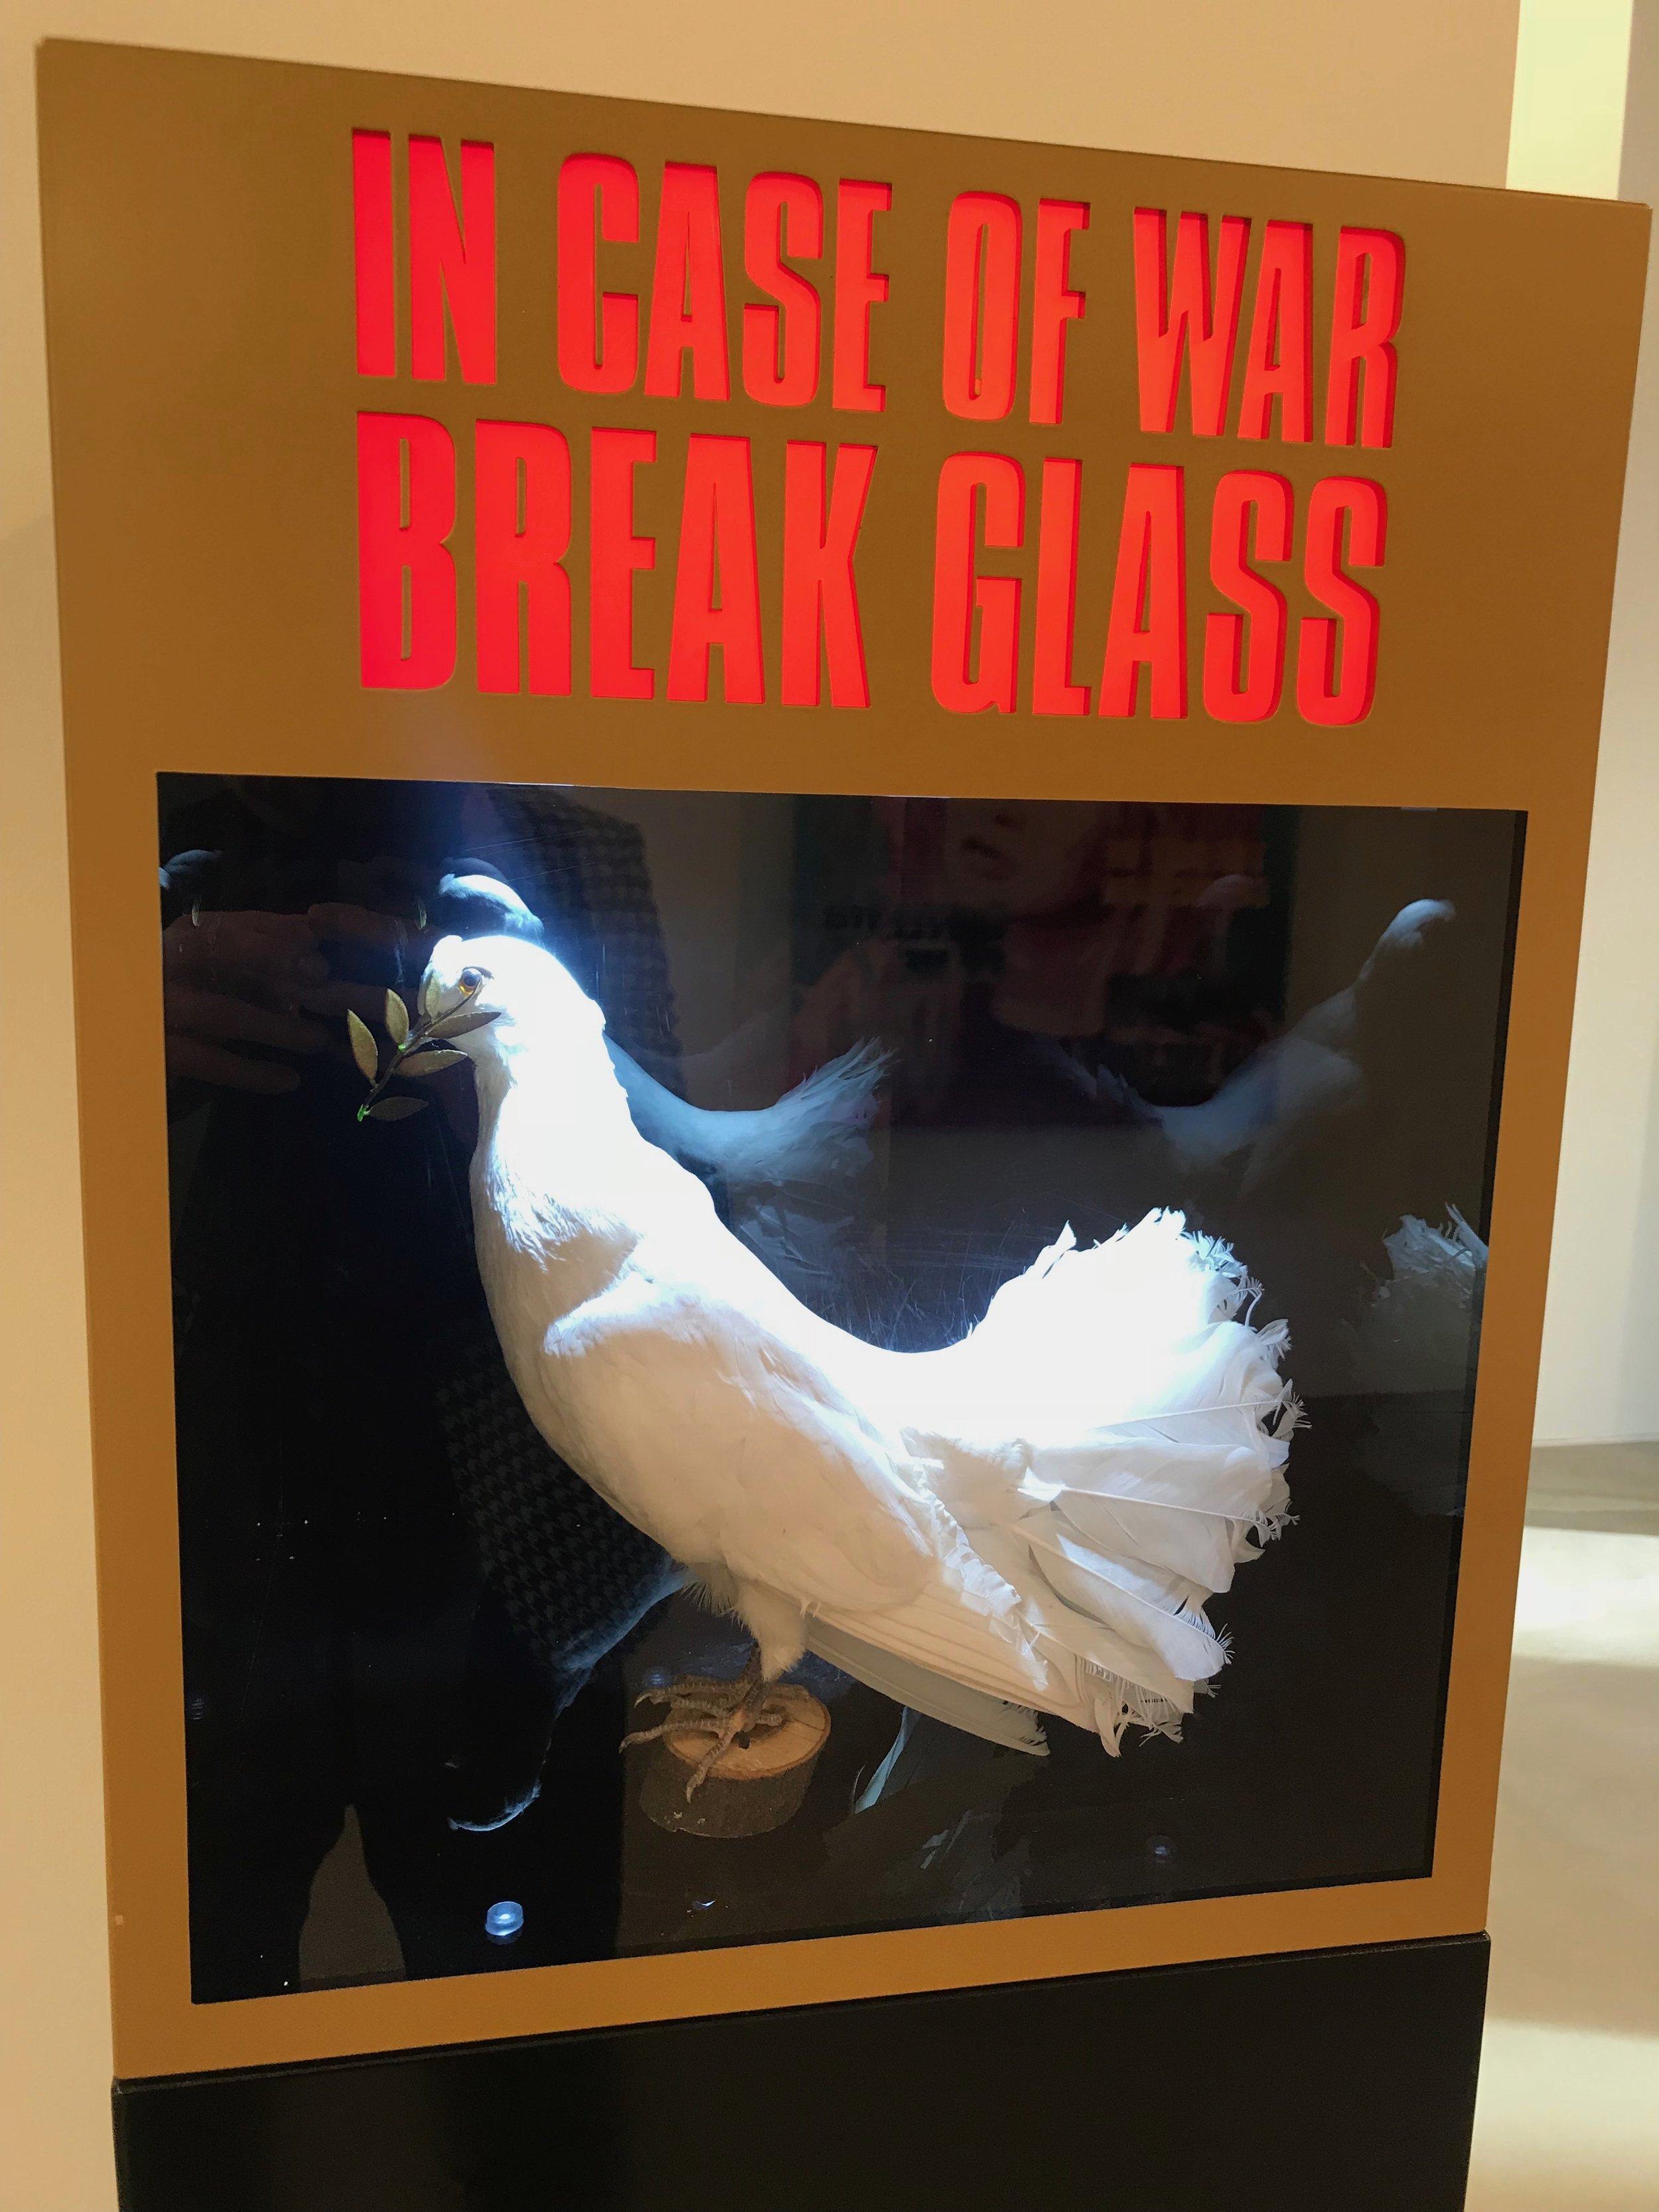 In Case of War